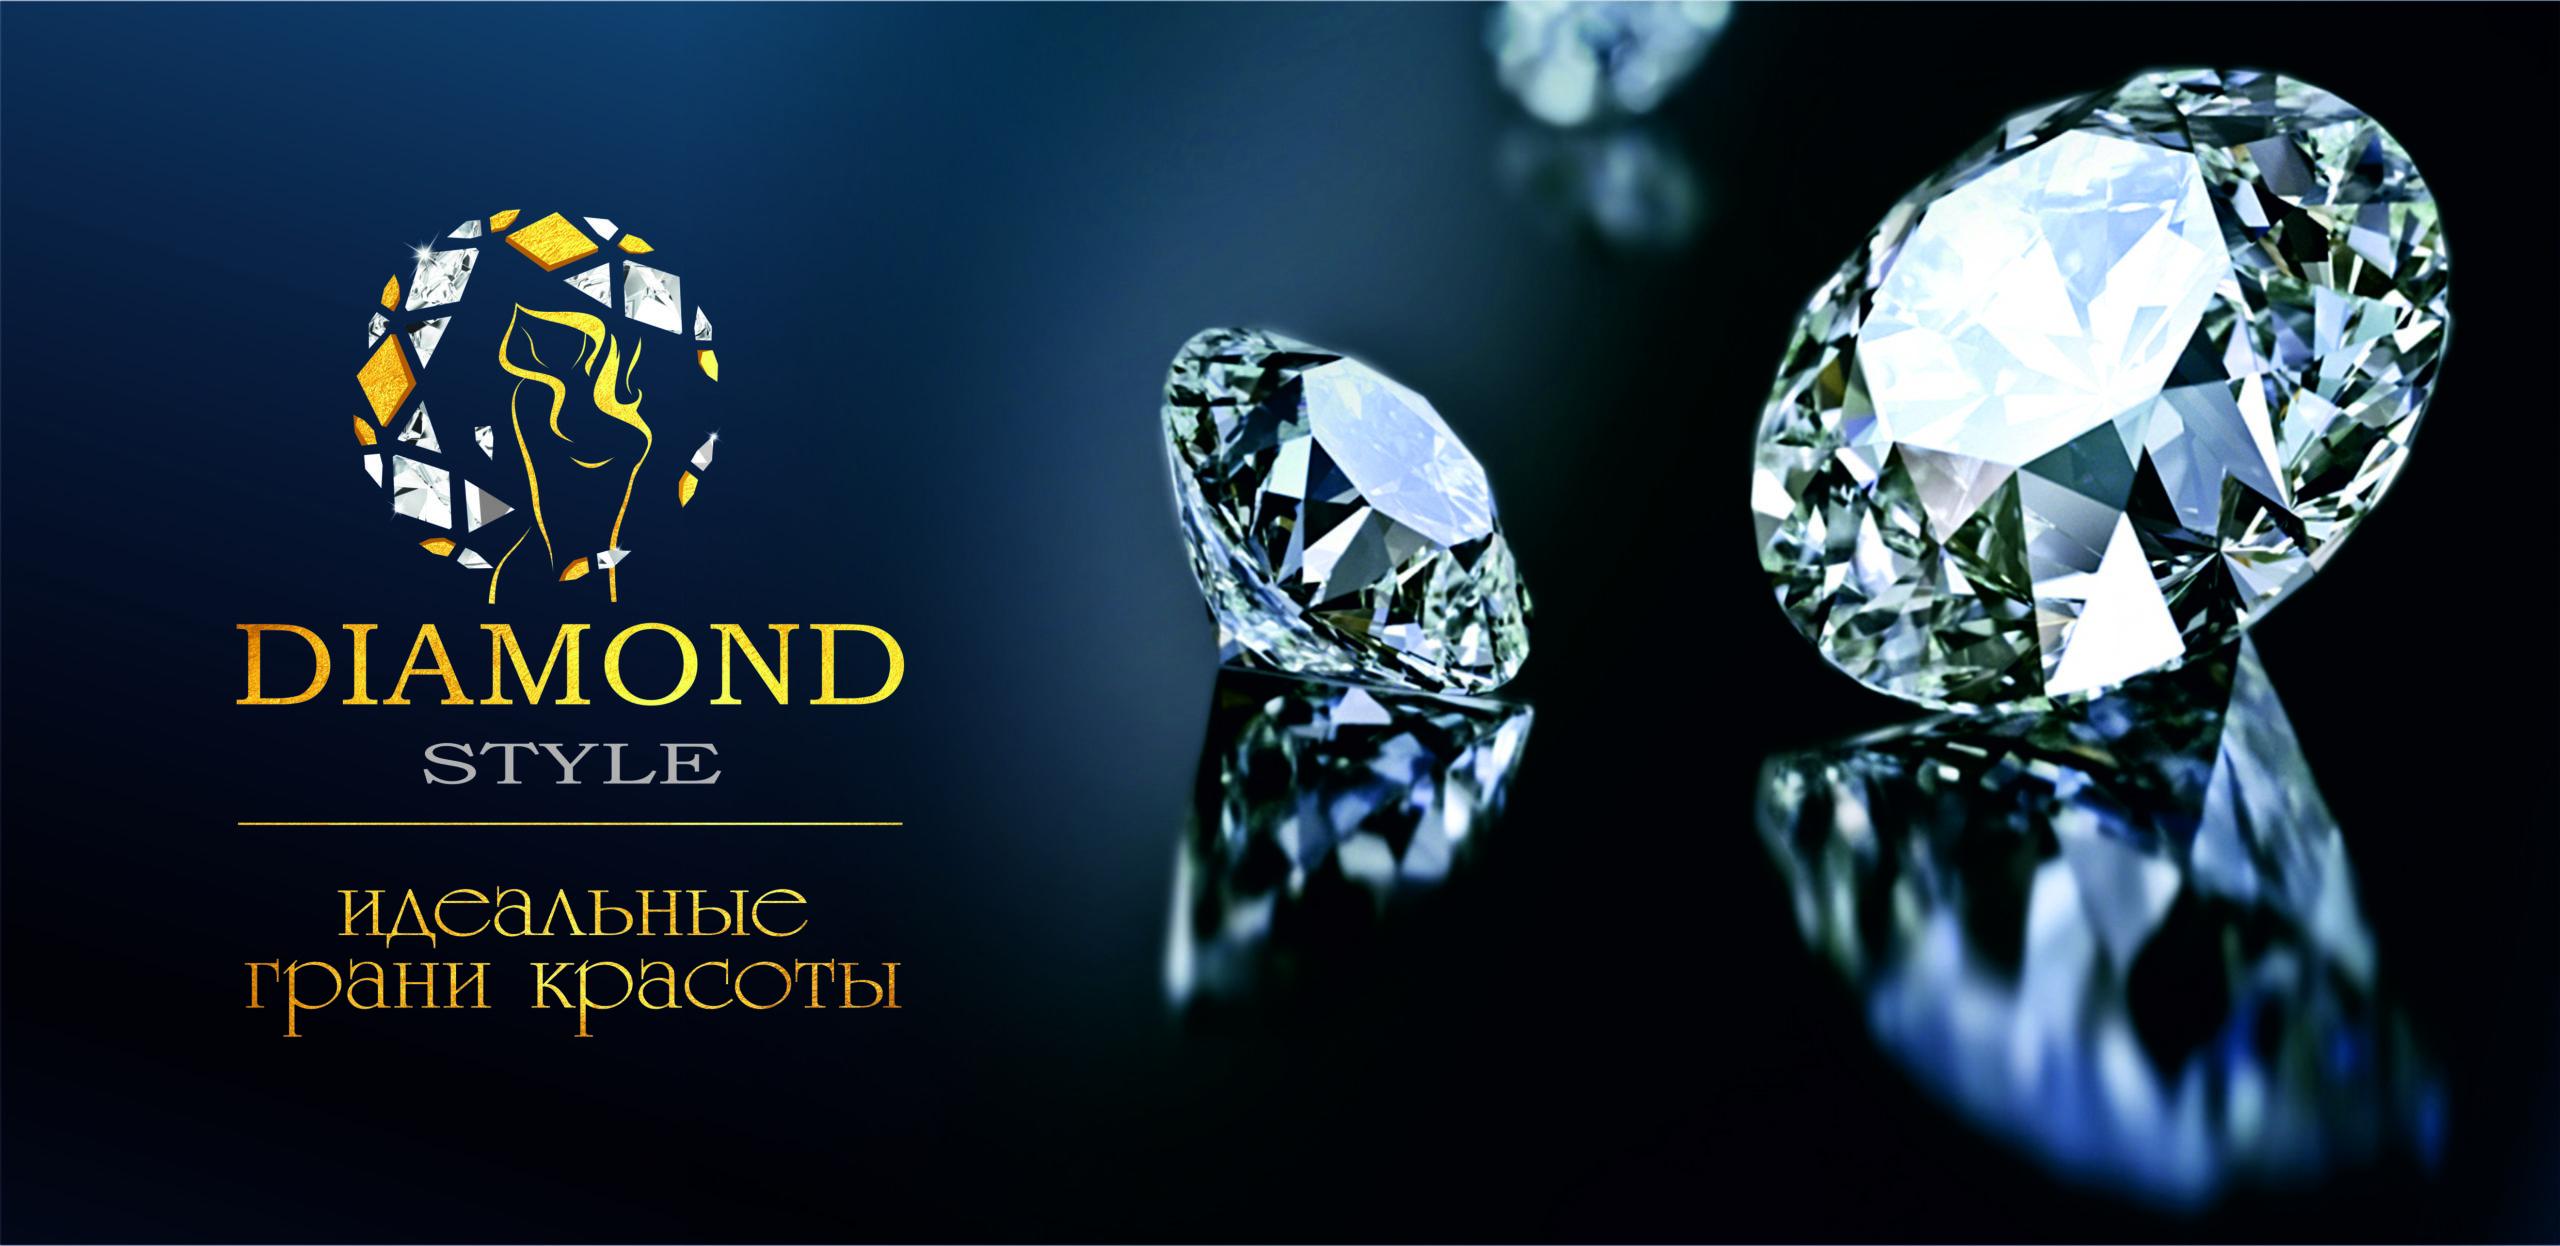 Центр красоты «Diamond Style» рад вновь дарить подарки!